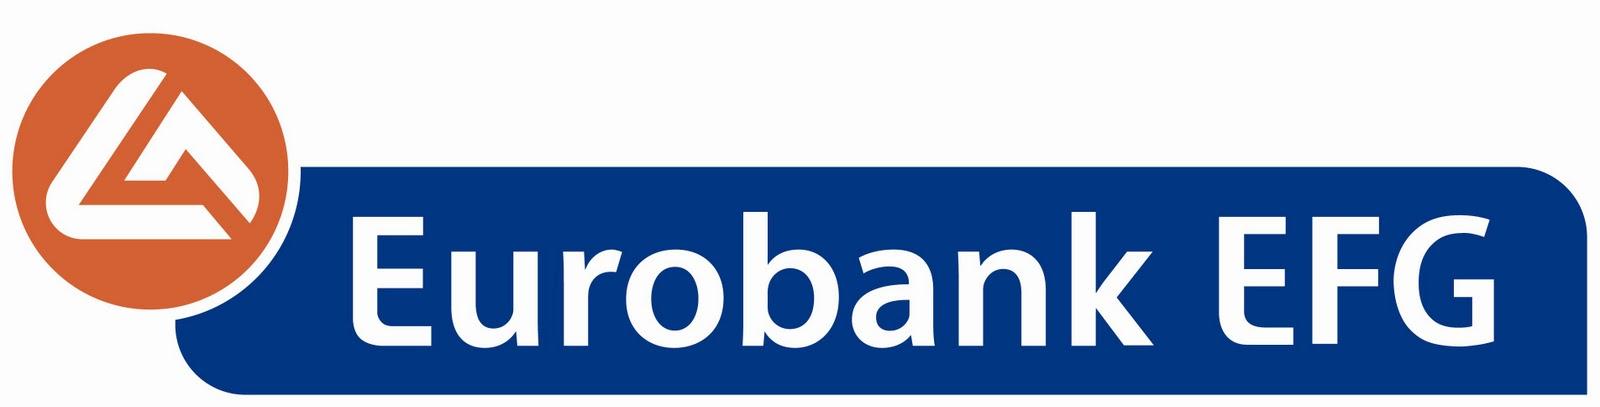 a0fb0-eurobank_logo.jpg Team Promotion Clients